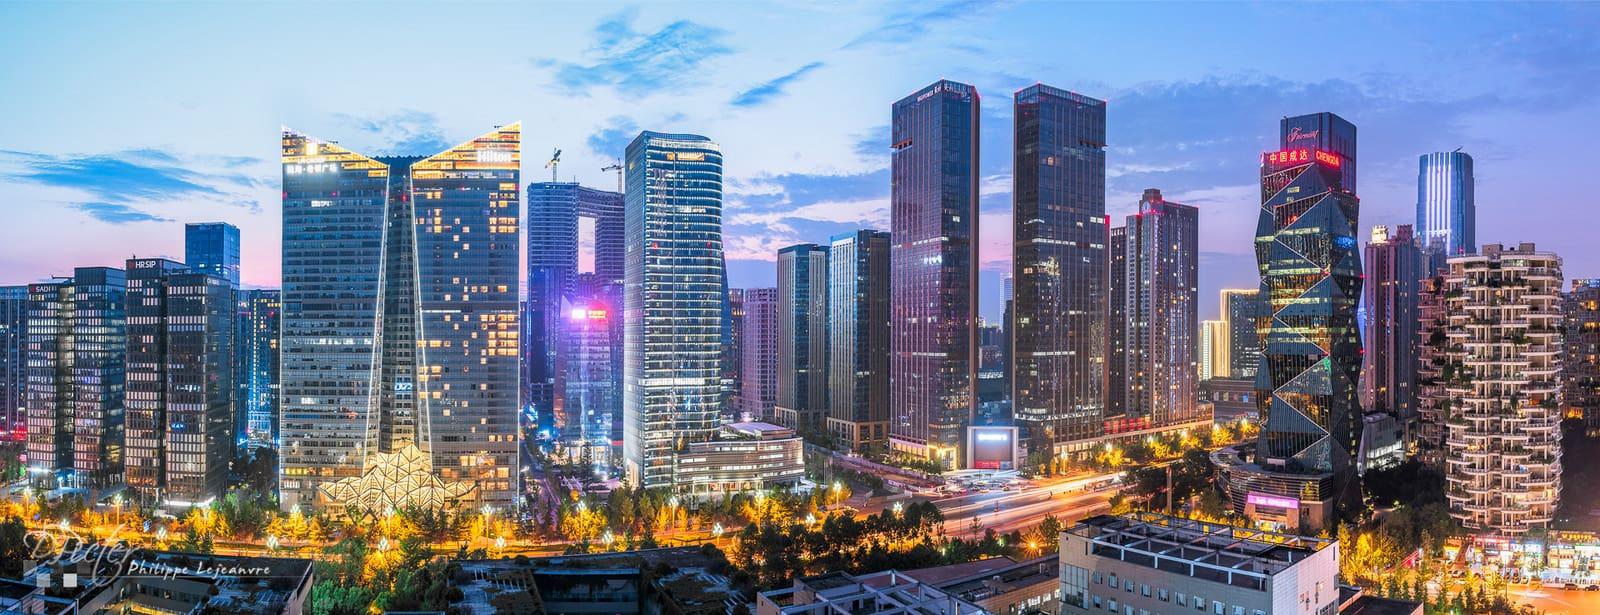 What's Happening in Chengdu? [Autumn] - Chengdu Expat